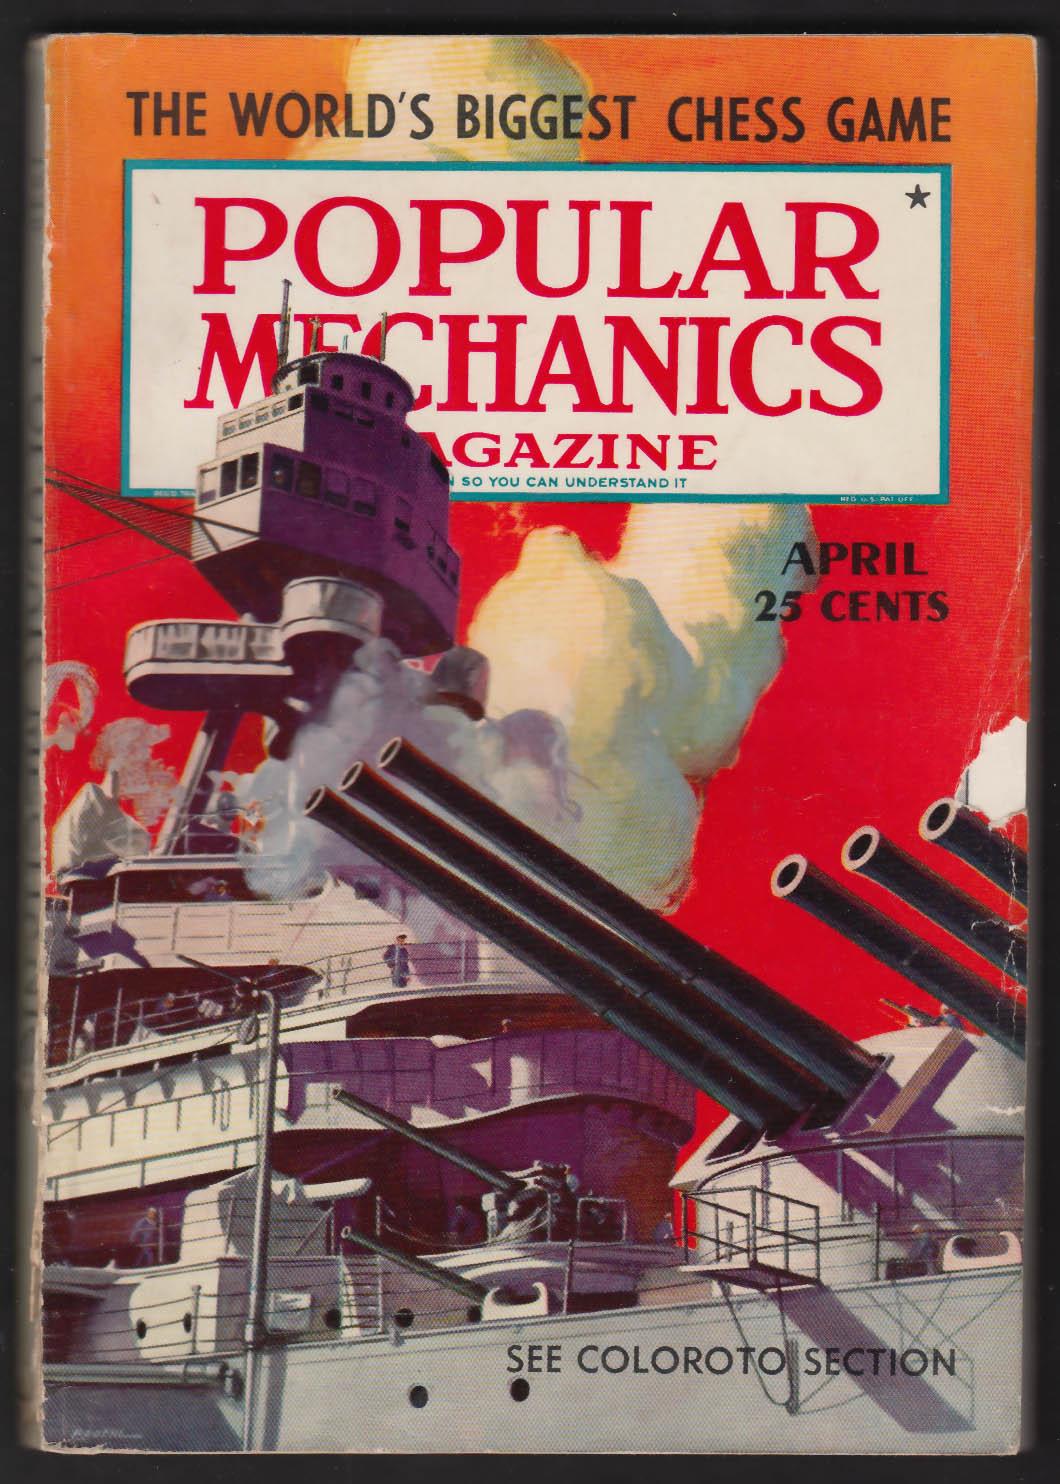 POPULAR MECHANICS Civil Aeronautics Authority Instrument Training US Navy 4 1940